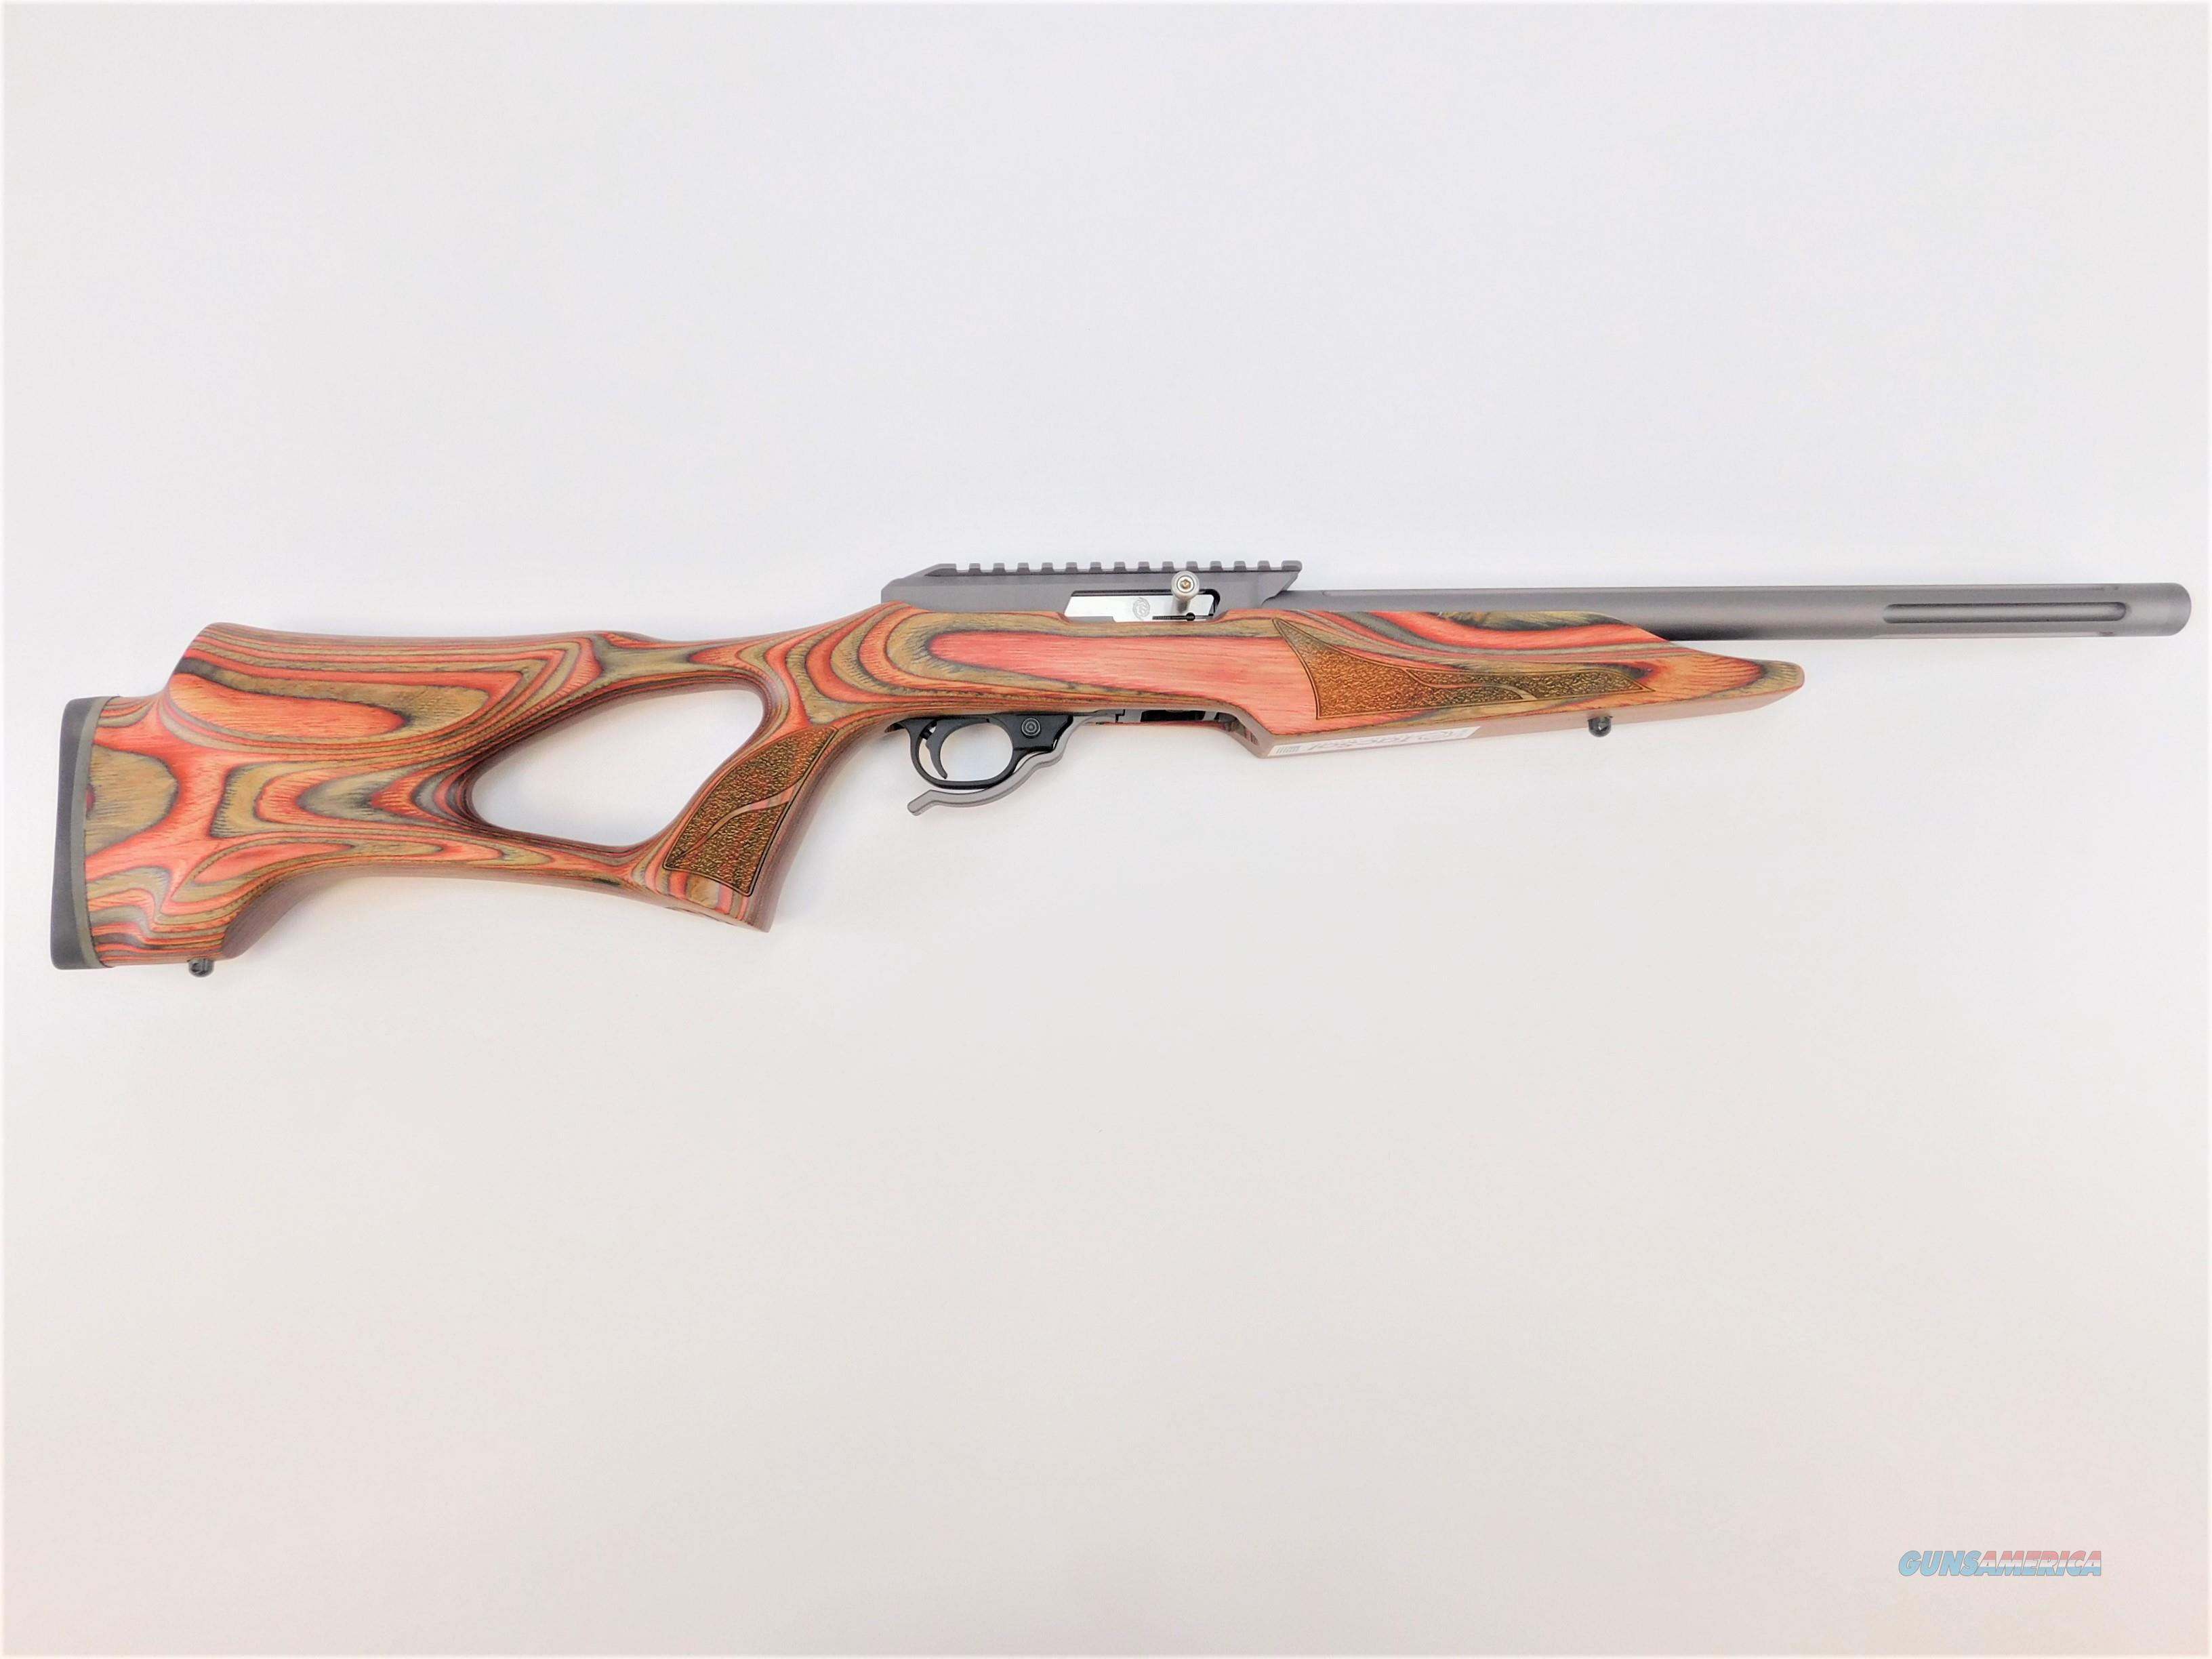 Tactical Solutions 10/22 X-Ring .22 LR Vantage RS Gun Metal Gray/Crimson TE-GMG-B-V-CRIM   Guns > Rifles > Ruger Rifles > 10-22